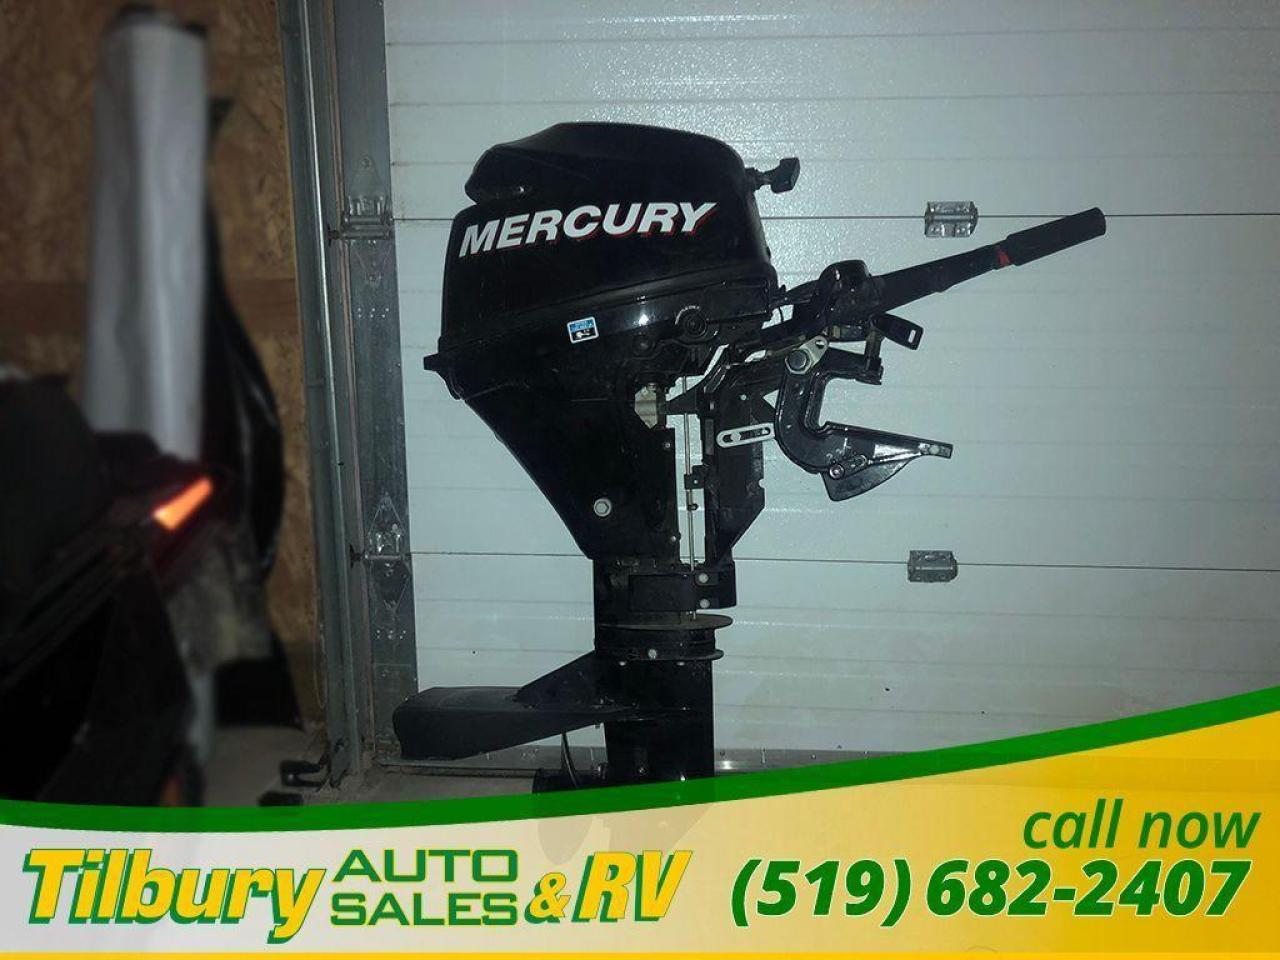 2011 Mercury 8HP Outboard Motor *Clean, quiet & fuel efficient*